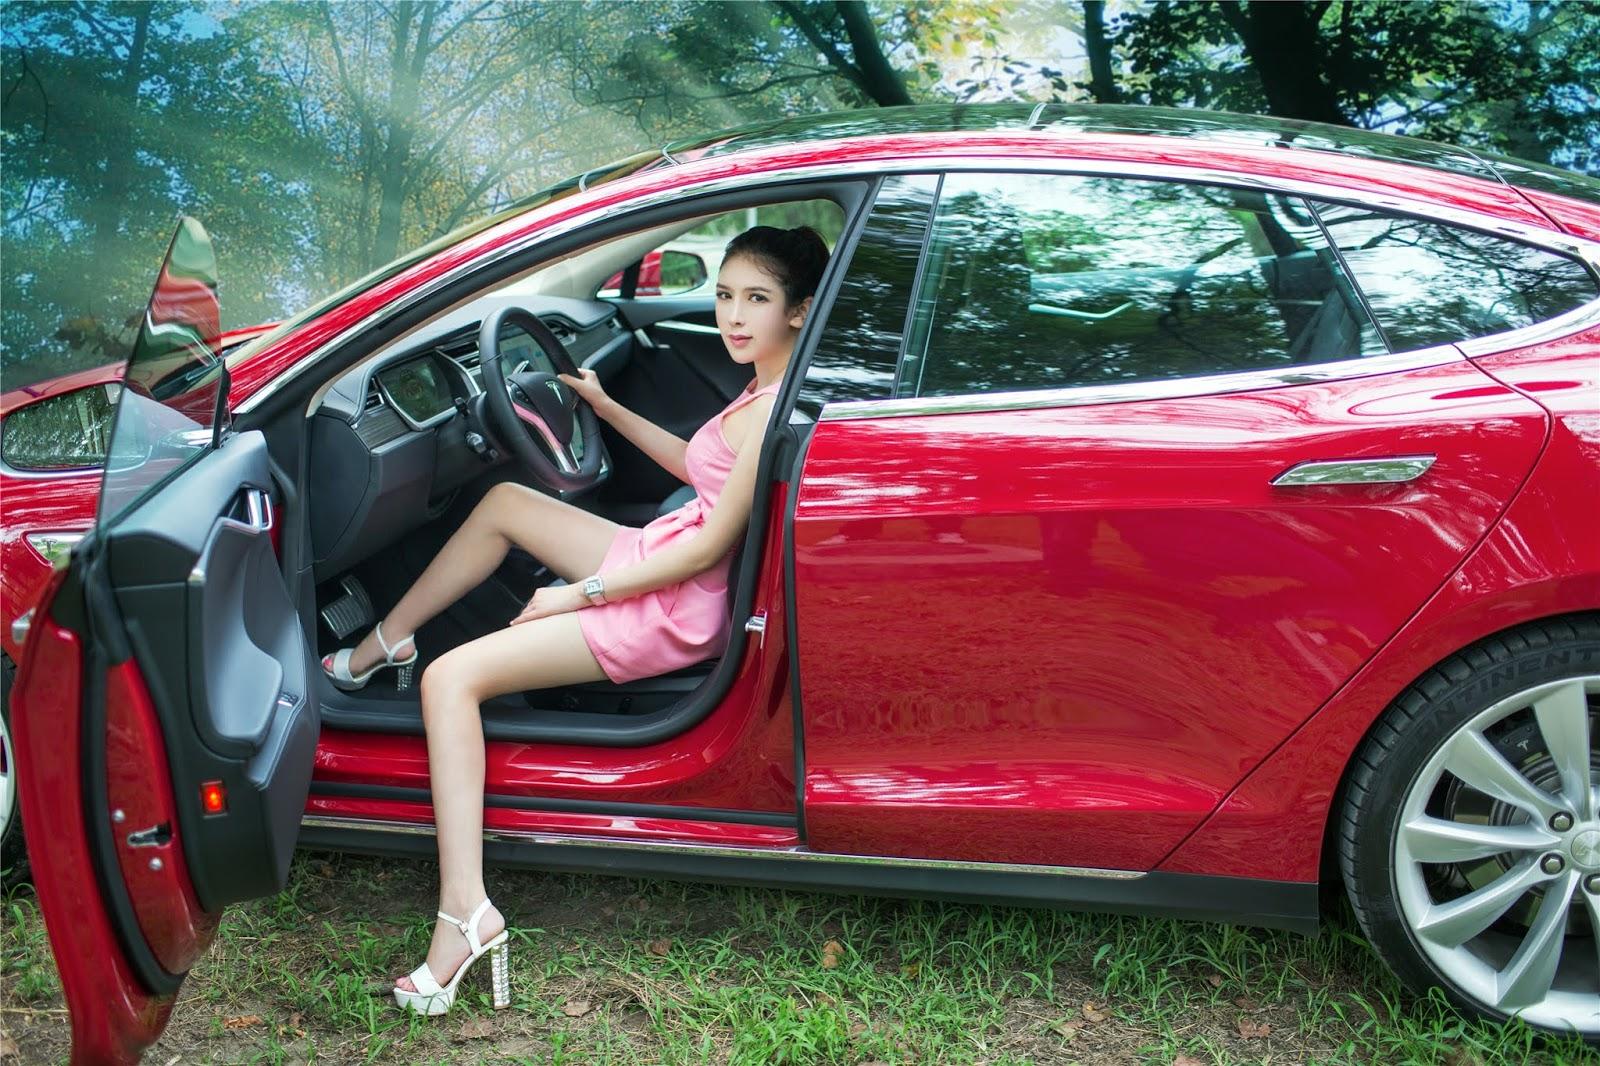 BoolWowGirls%2B%252837%2529 - Li LiSha 李丽莎 Beautiful Nude Model